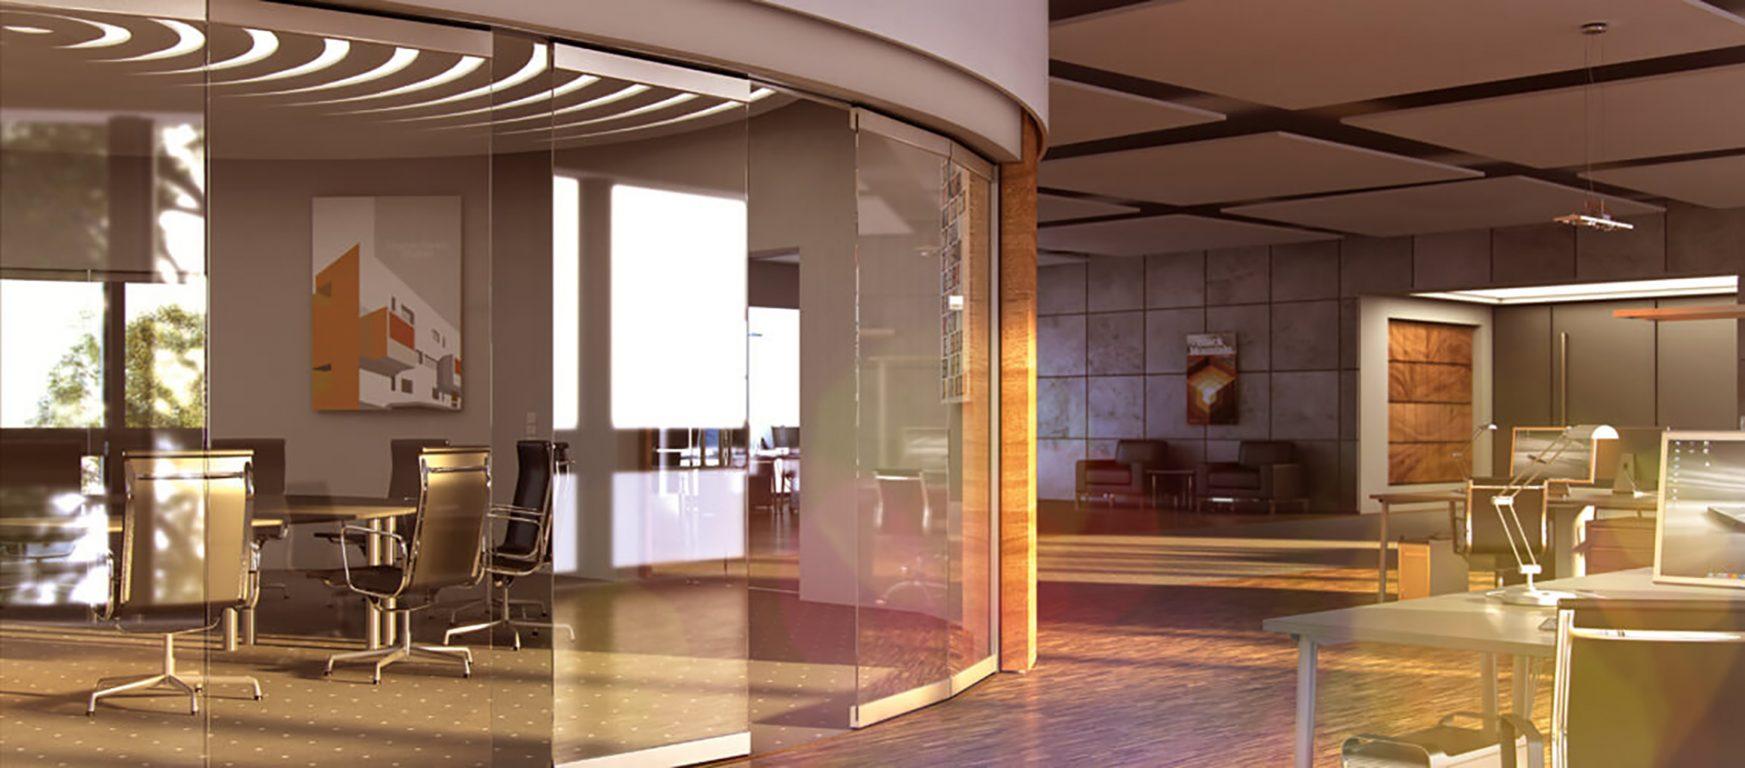 Sunflex SF 40 HSW sliding glass walls